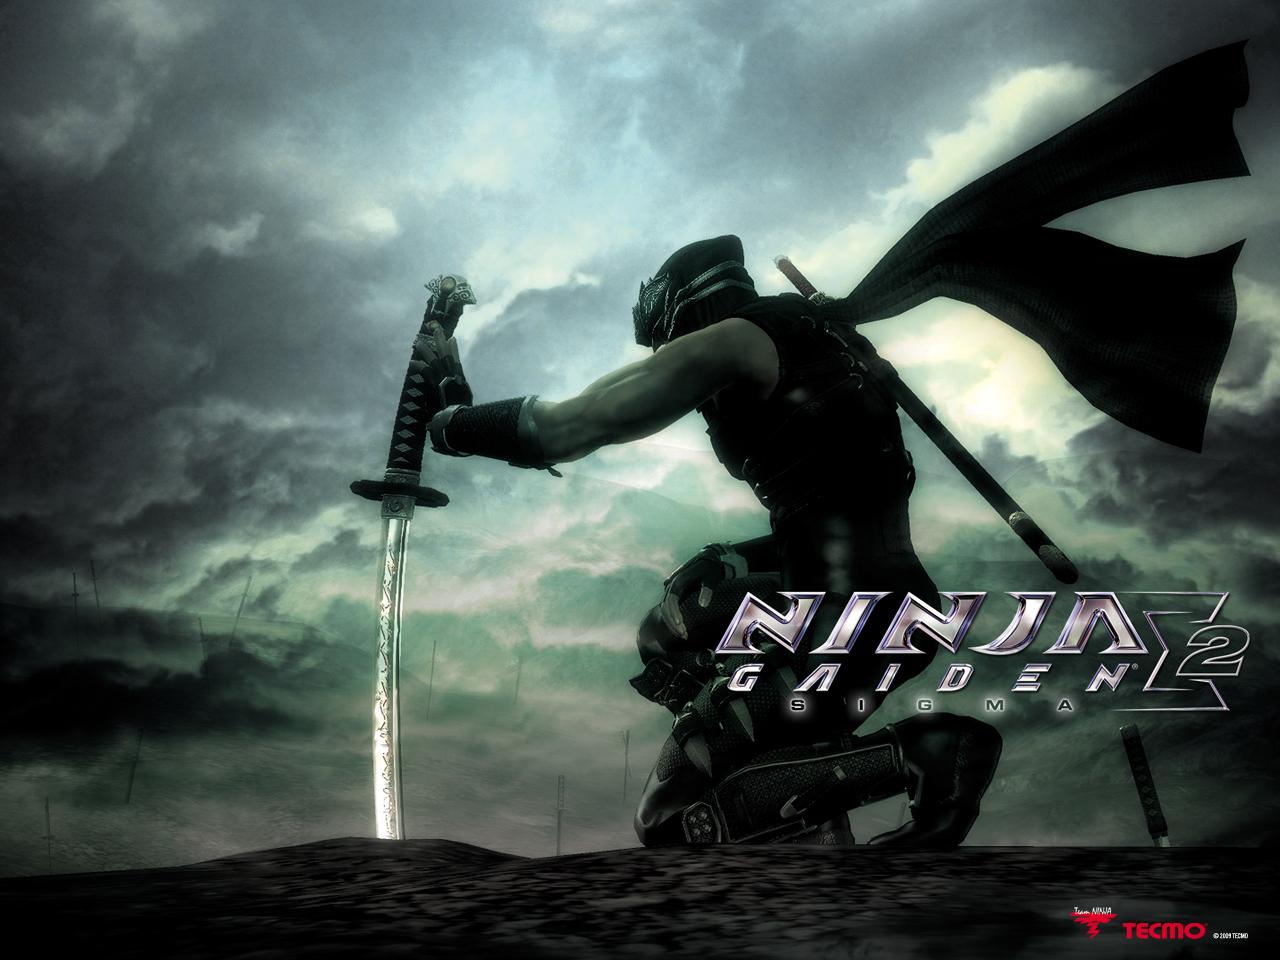 Ninja Gaiden Sigma 2 PS3 Game Wallpapers HD Wallpapers 1280x960